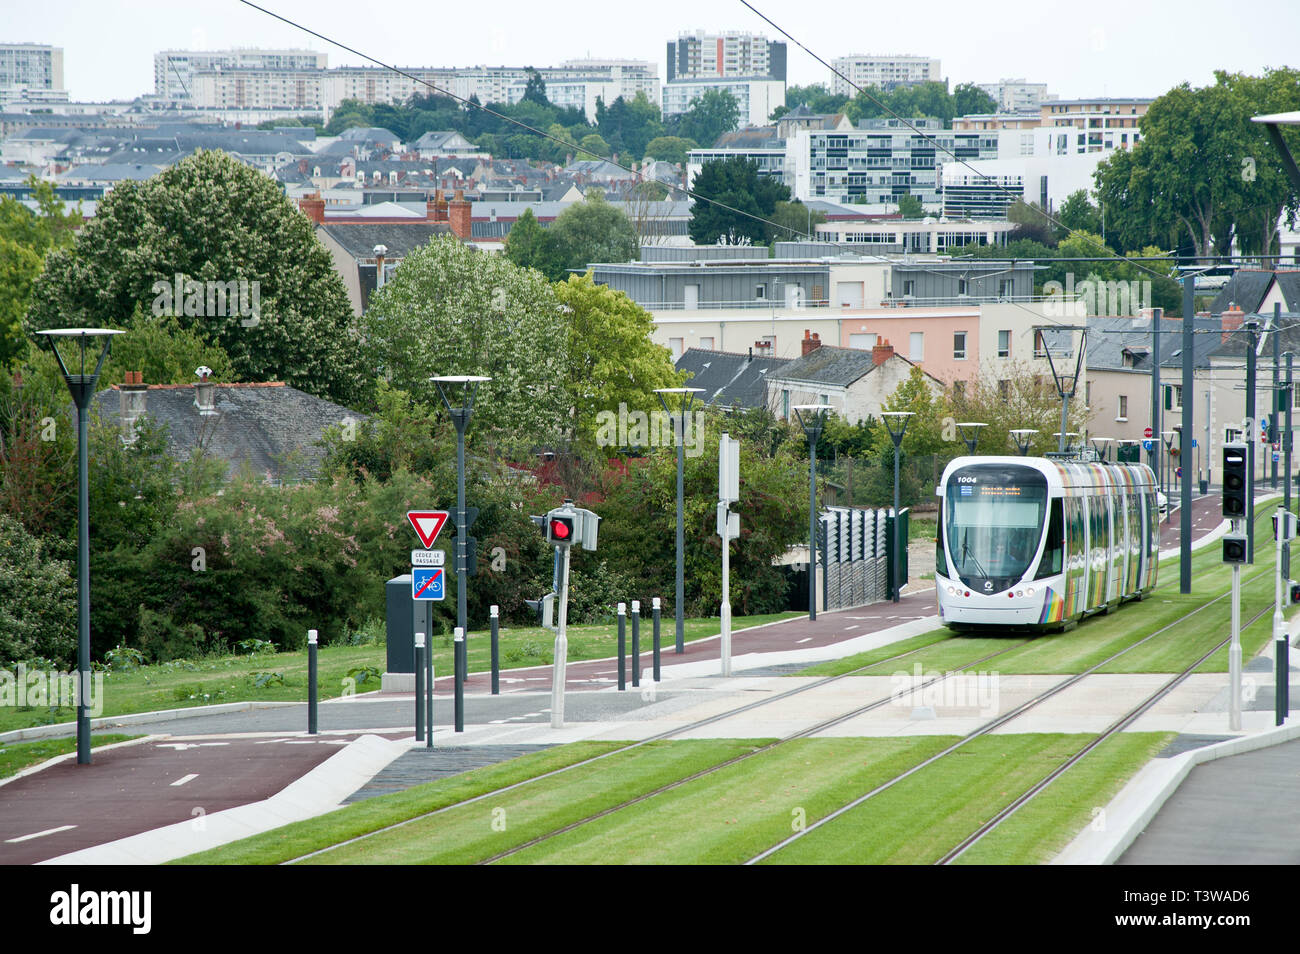 Angers, moderne Straßenbahn, Durchfahrt Institut de Biologie en Santé, CHU Angers - Angers, modern Tramway, Passage Institut de Biologie en Santé, CHU - Stock Image